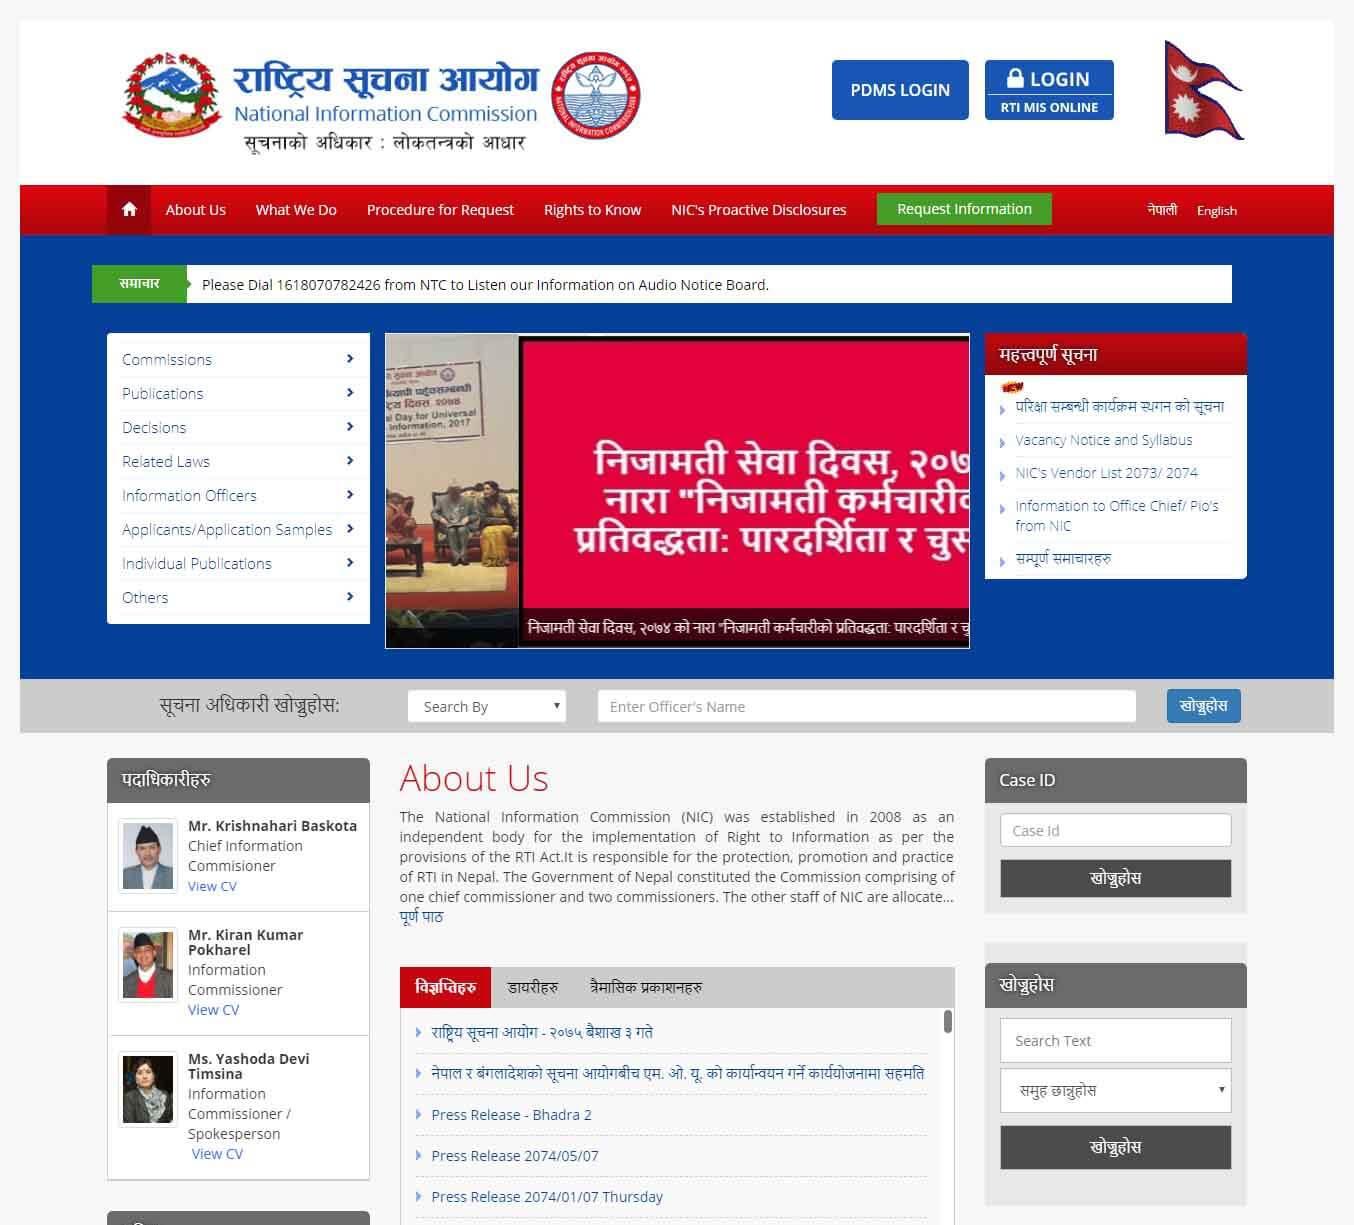 My Portfolio - Jeevan Dhakal